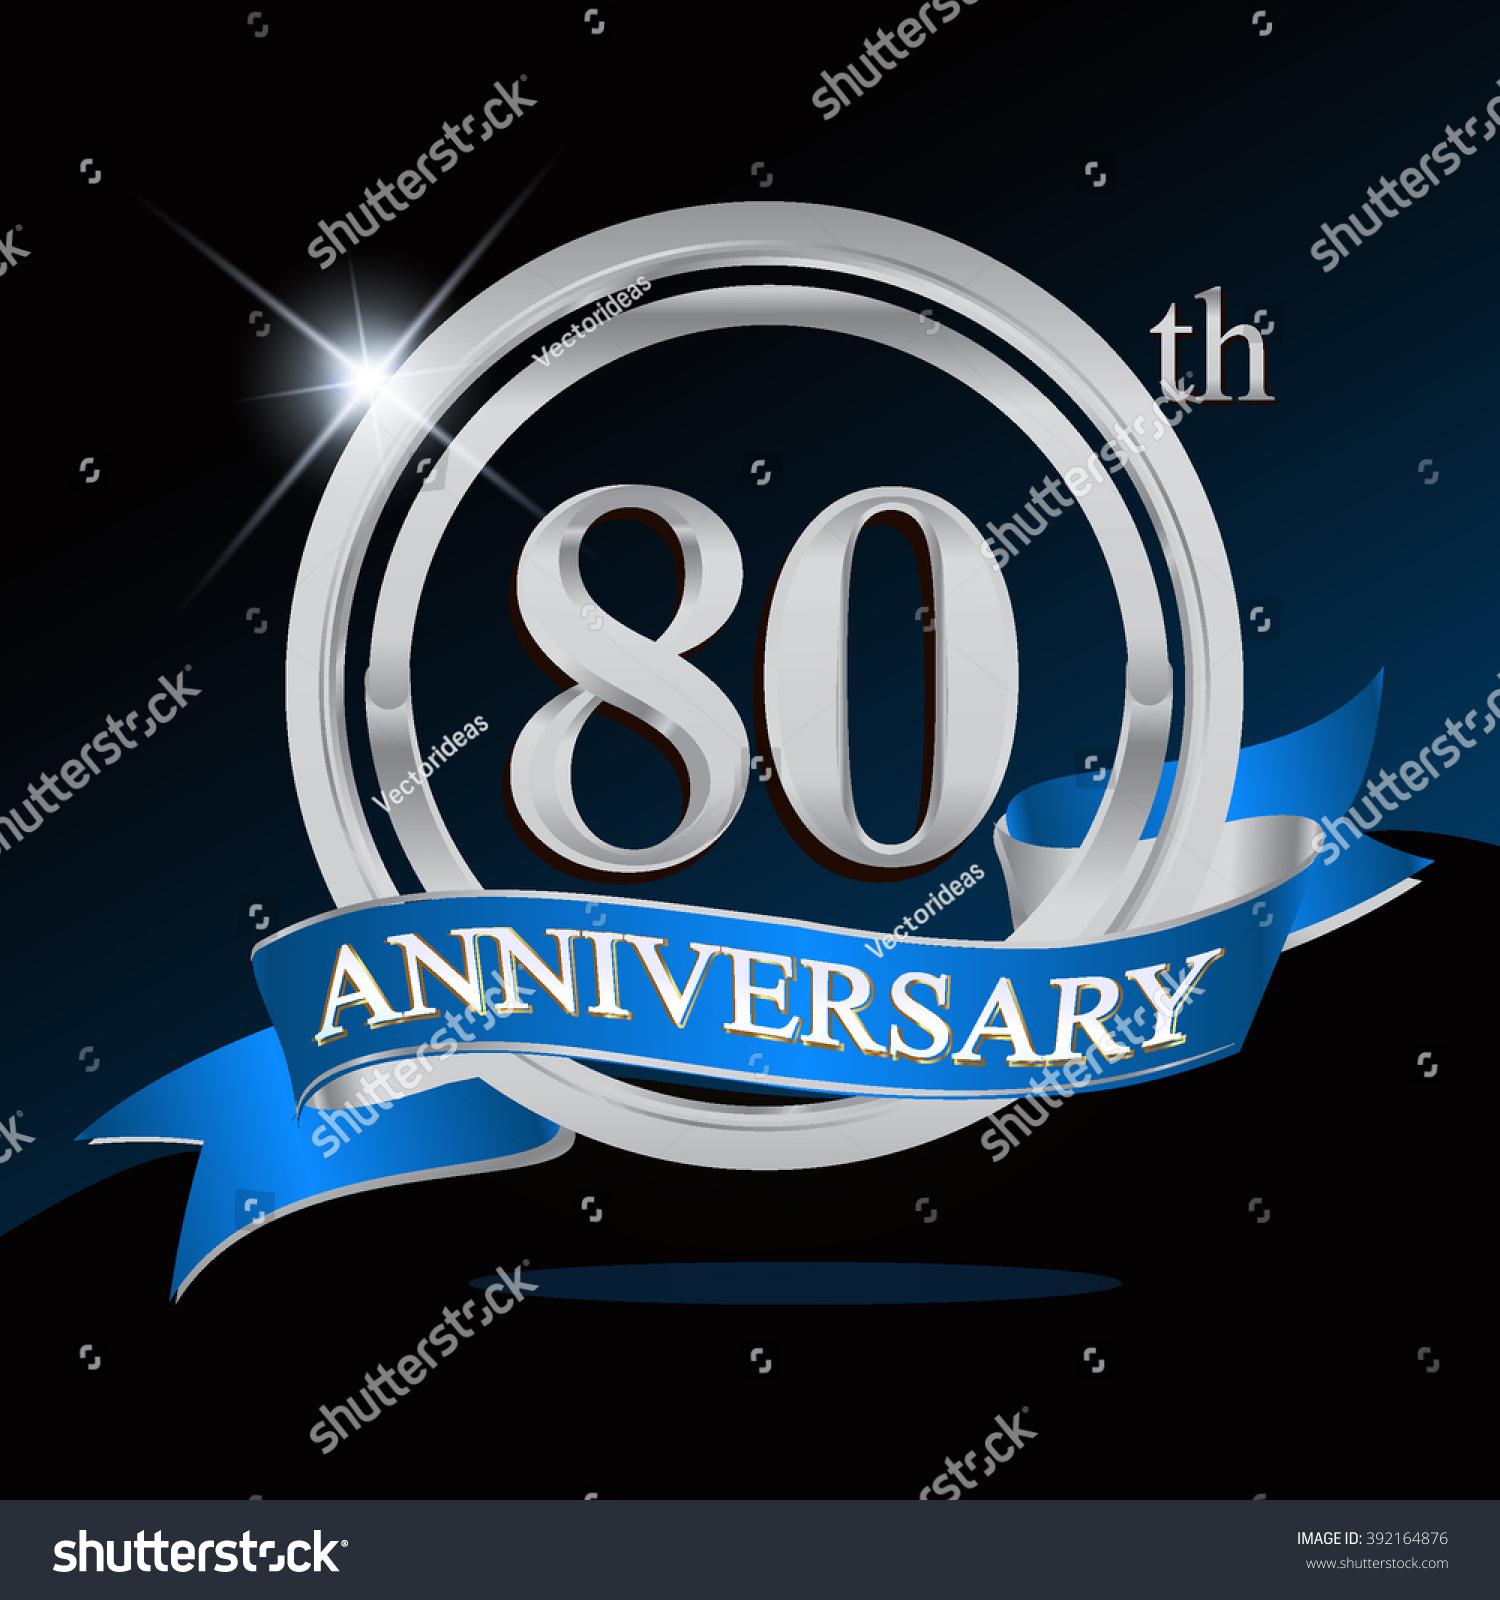 80th anniversary logo blue ribbon silver stock vector